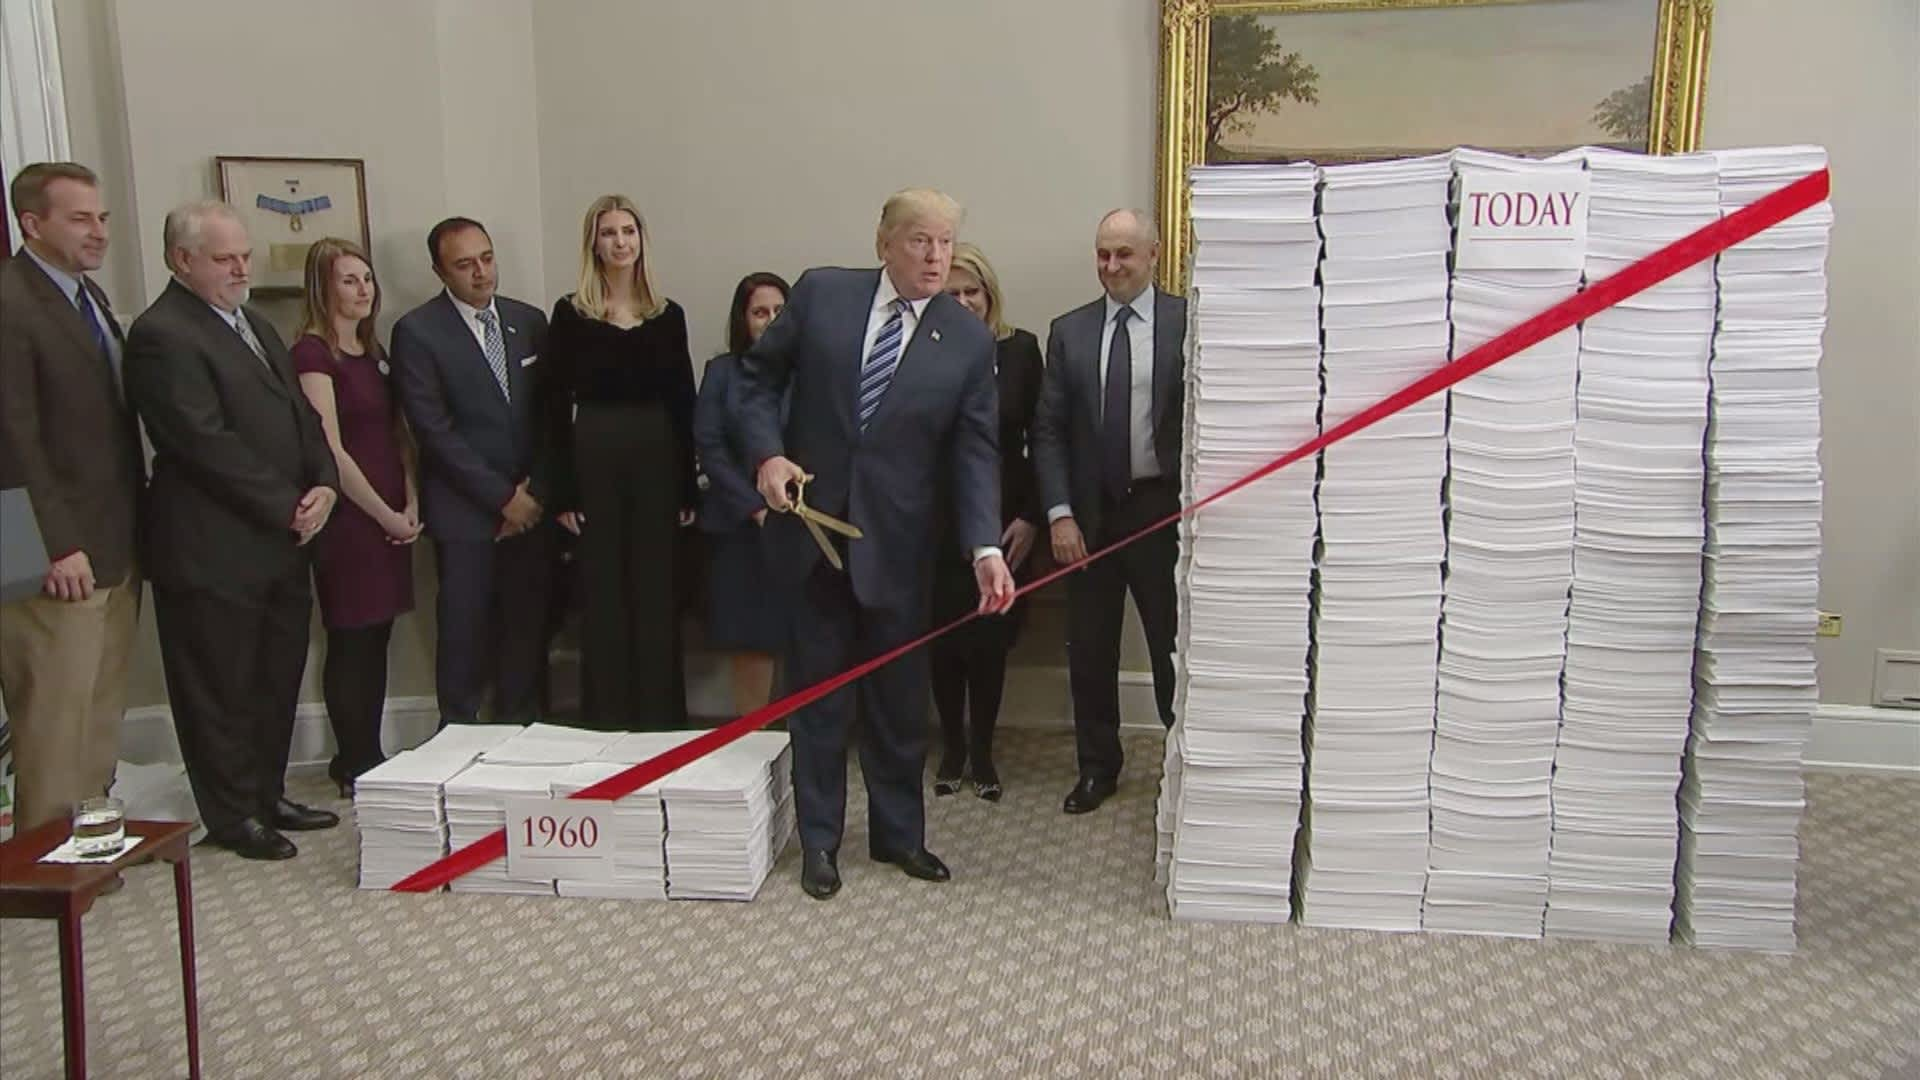 Trump promotes corporate bonuses after GOP tax plan passes